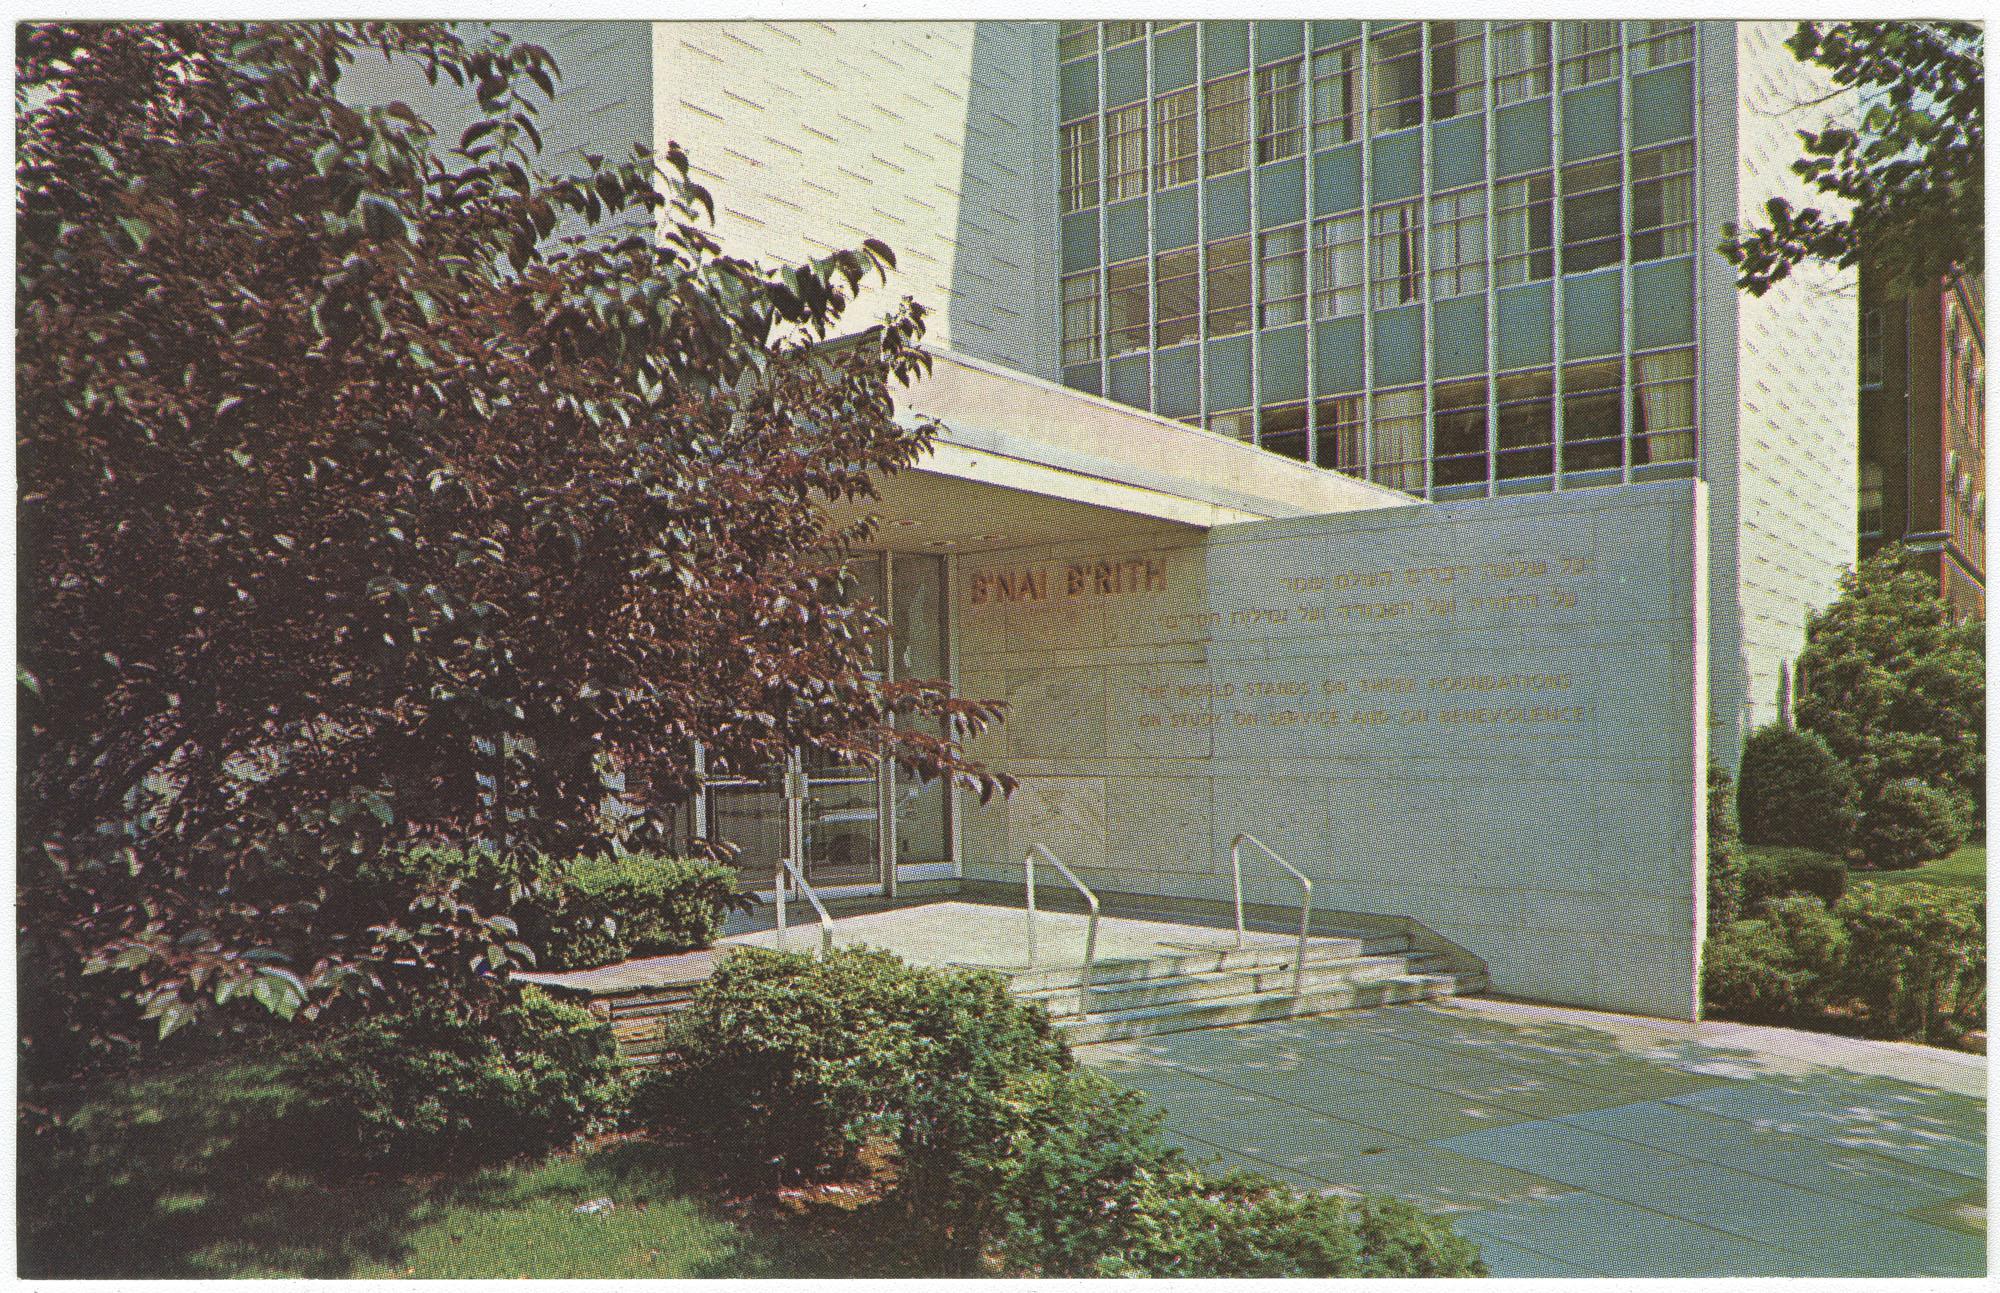 Entrance, B'nai B'rith Building, Washington, D.C.